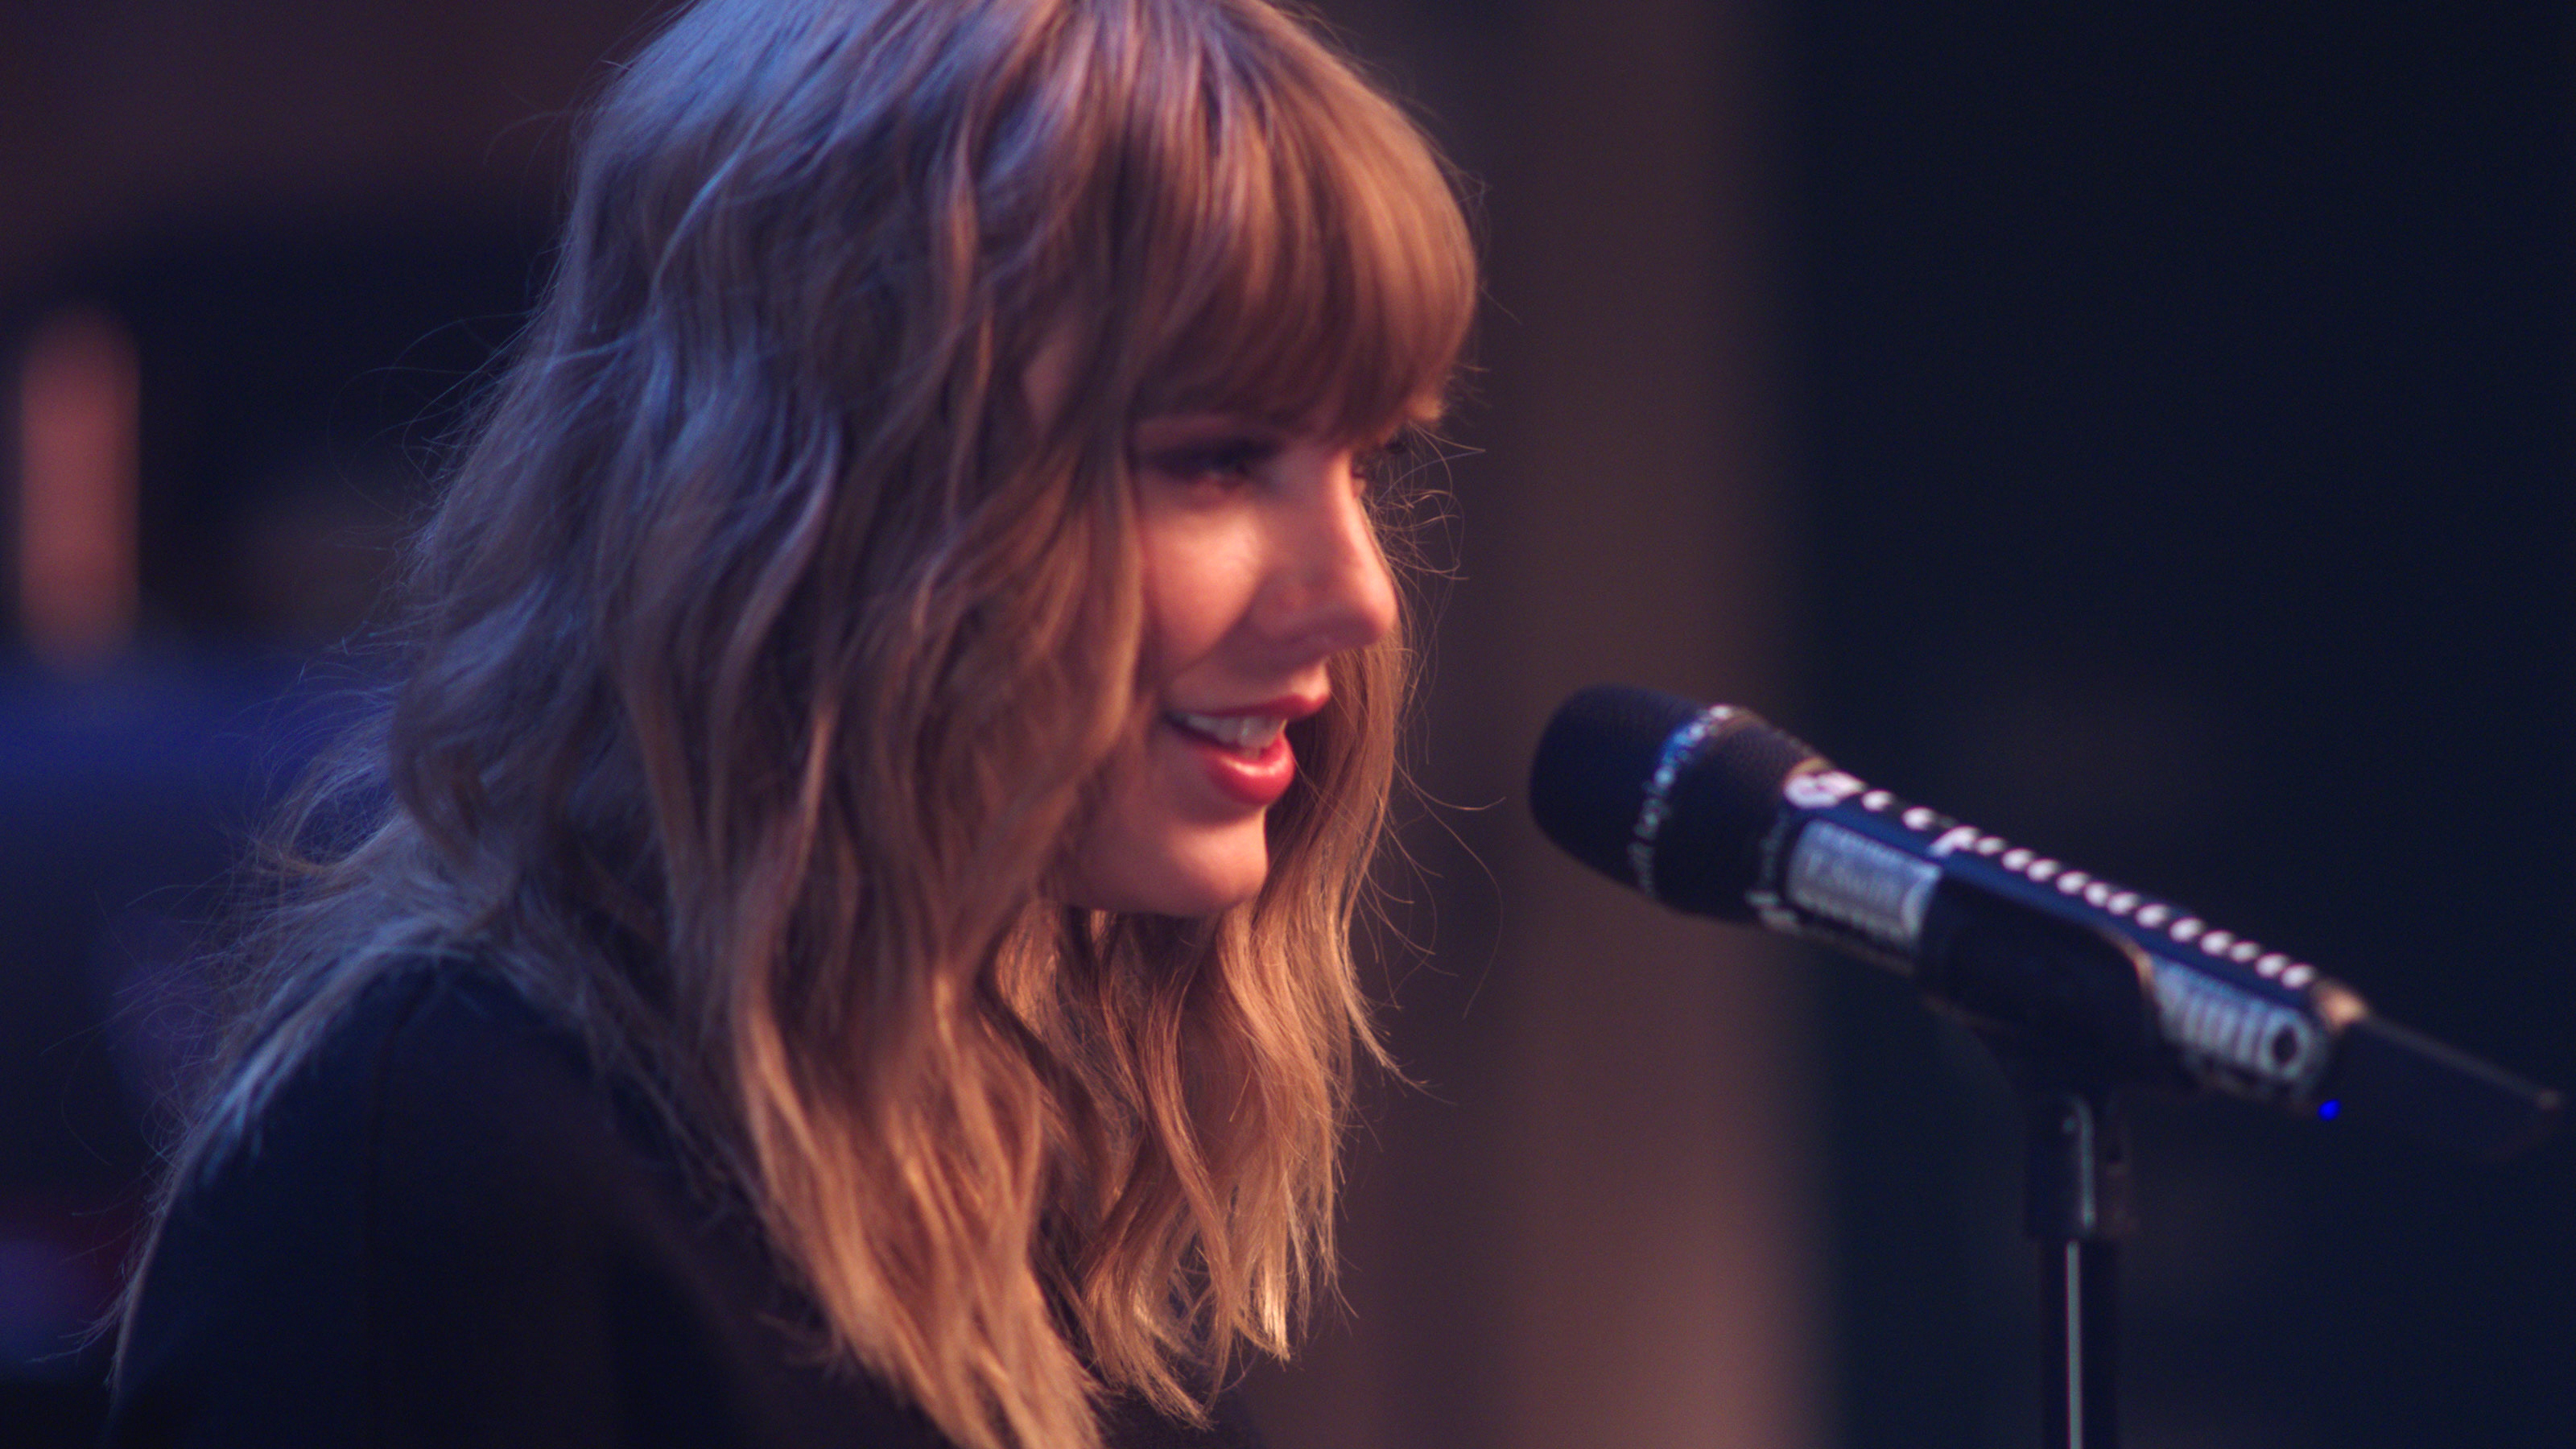 Taylor Swift – Spotify Singles